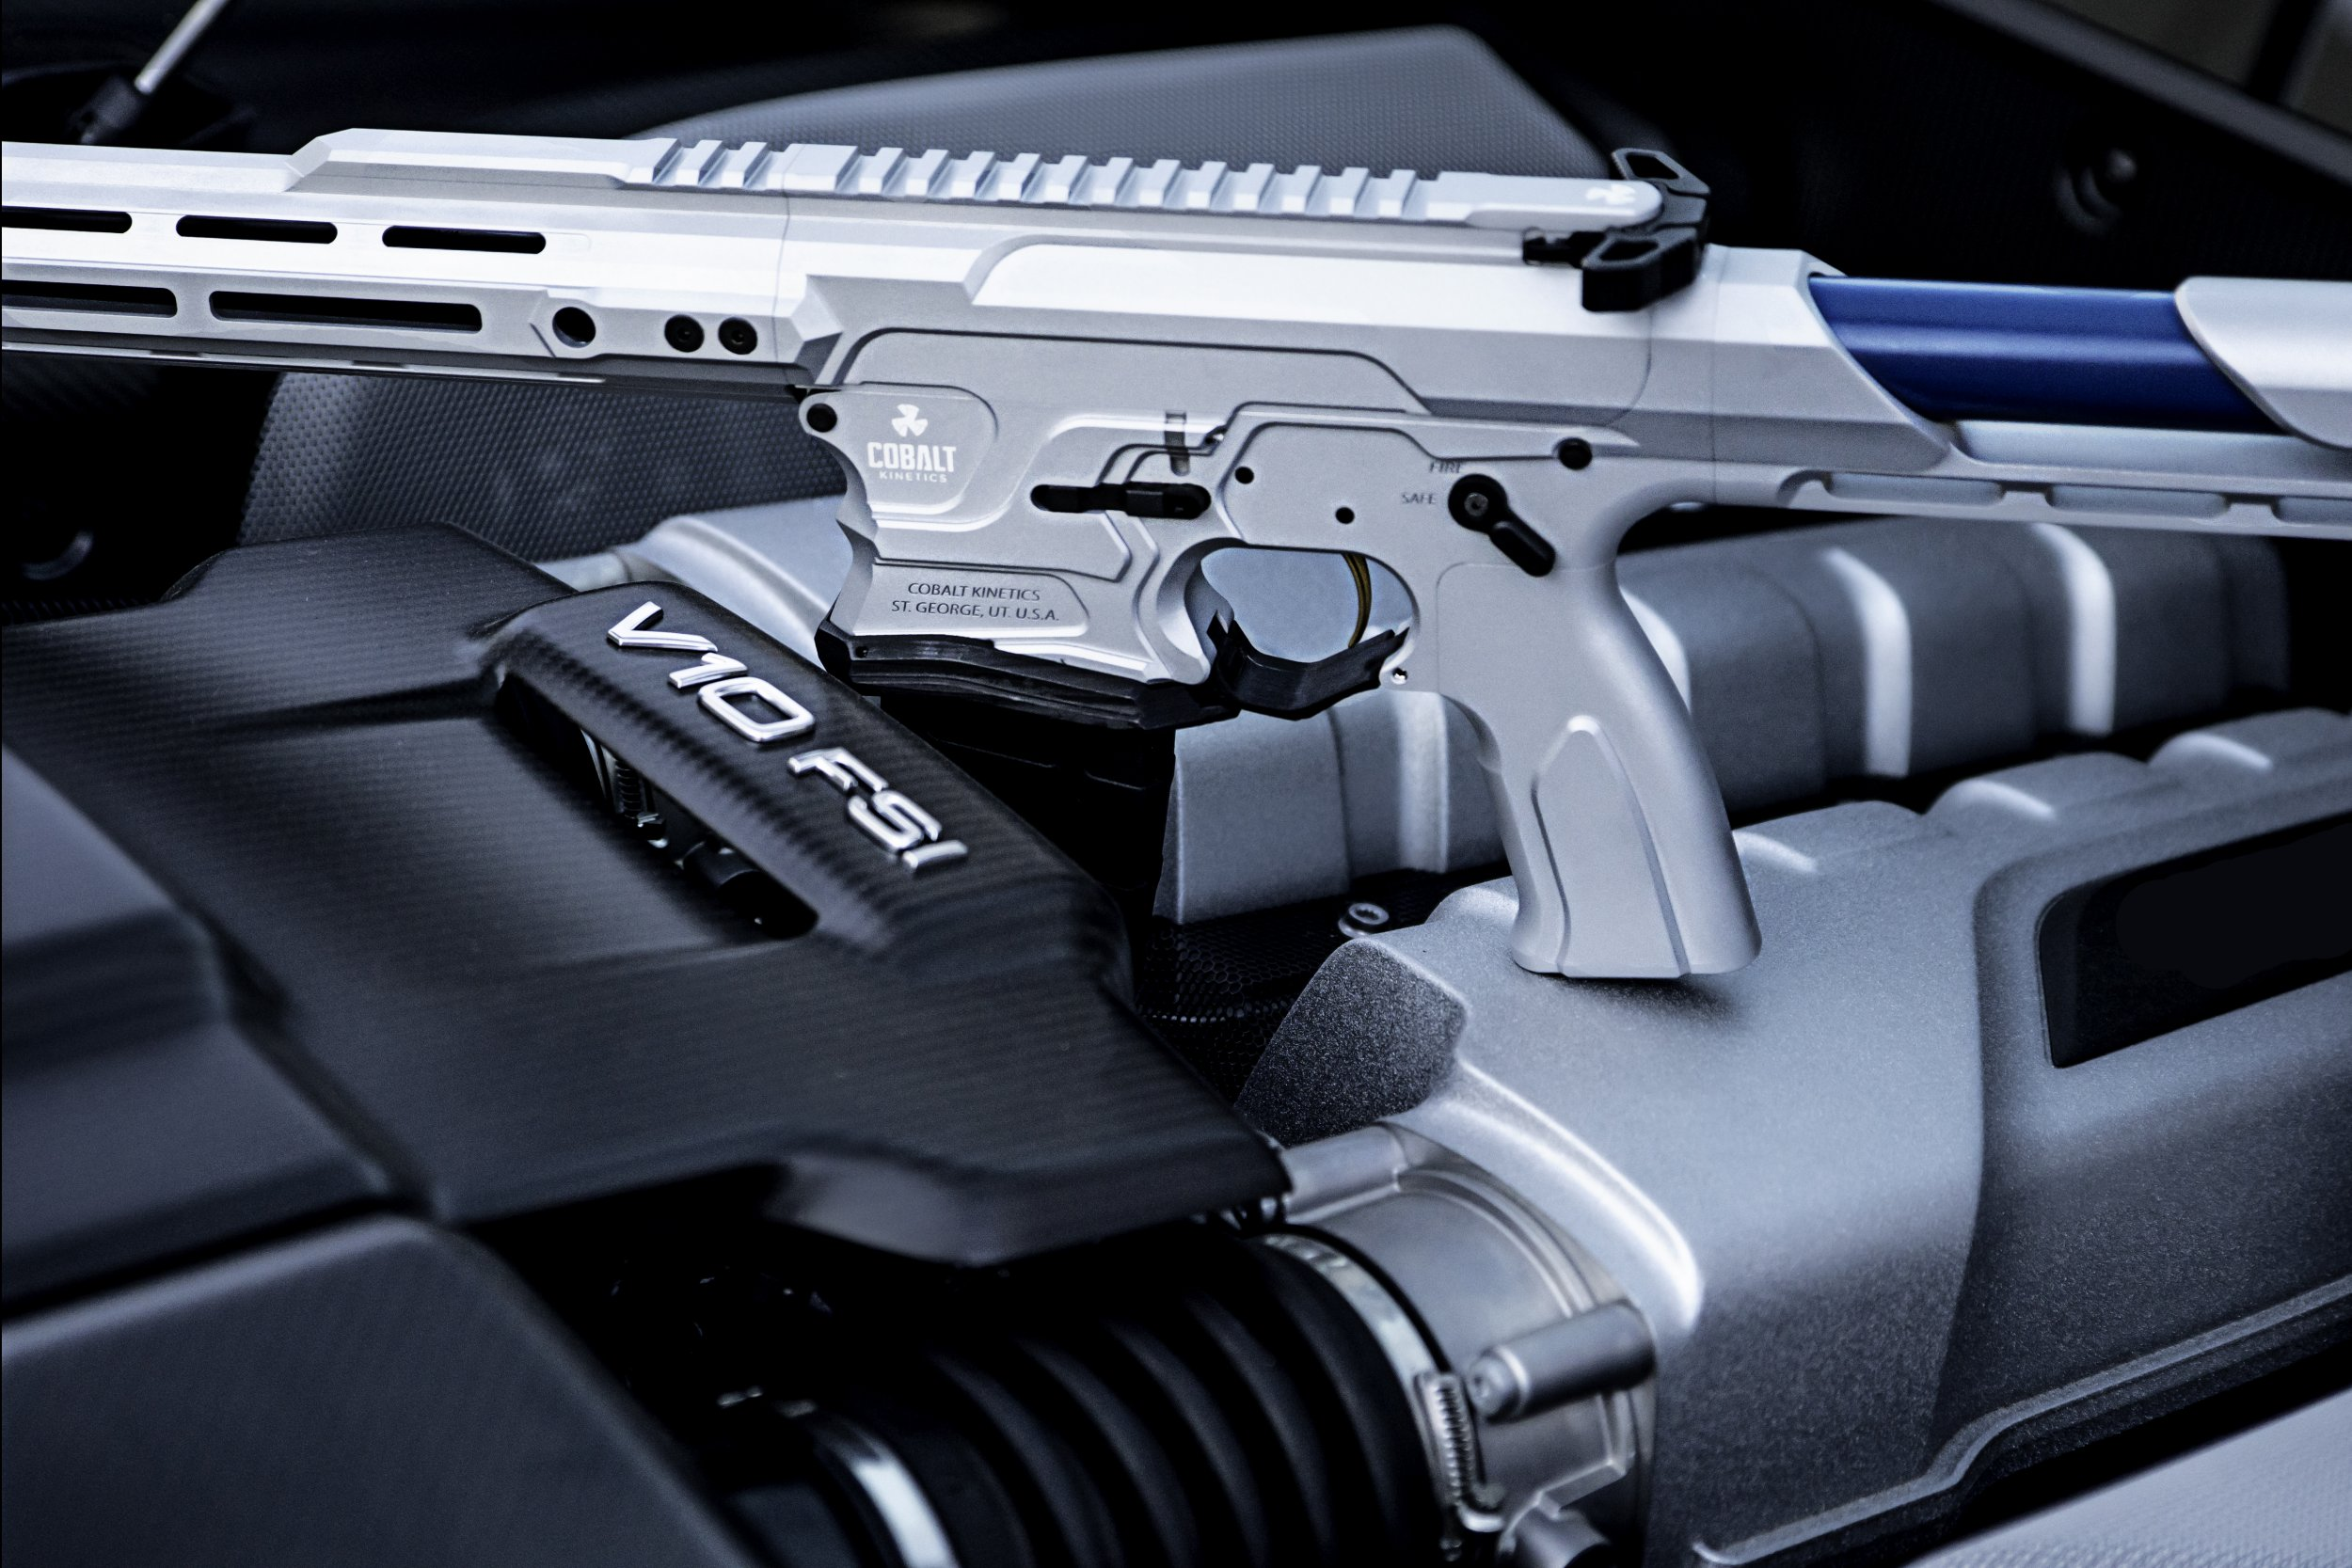 Cobalt Kinetics Evolve 3-Gun Competition/Tactical AR-15